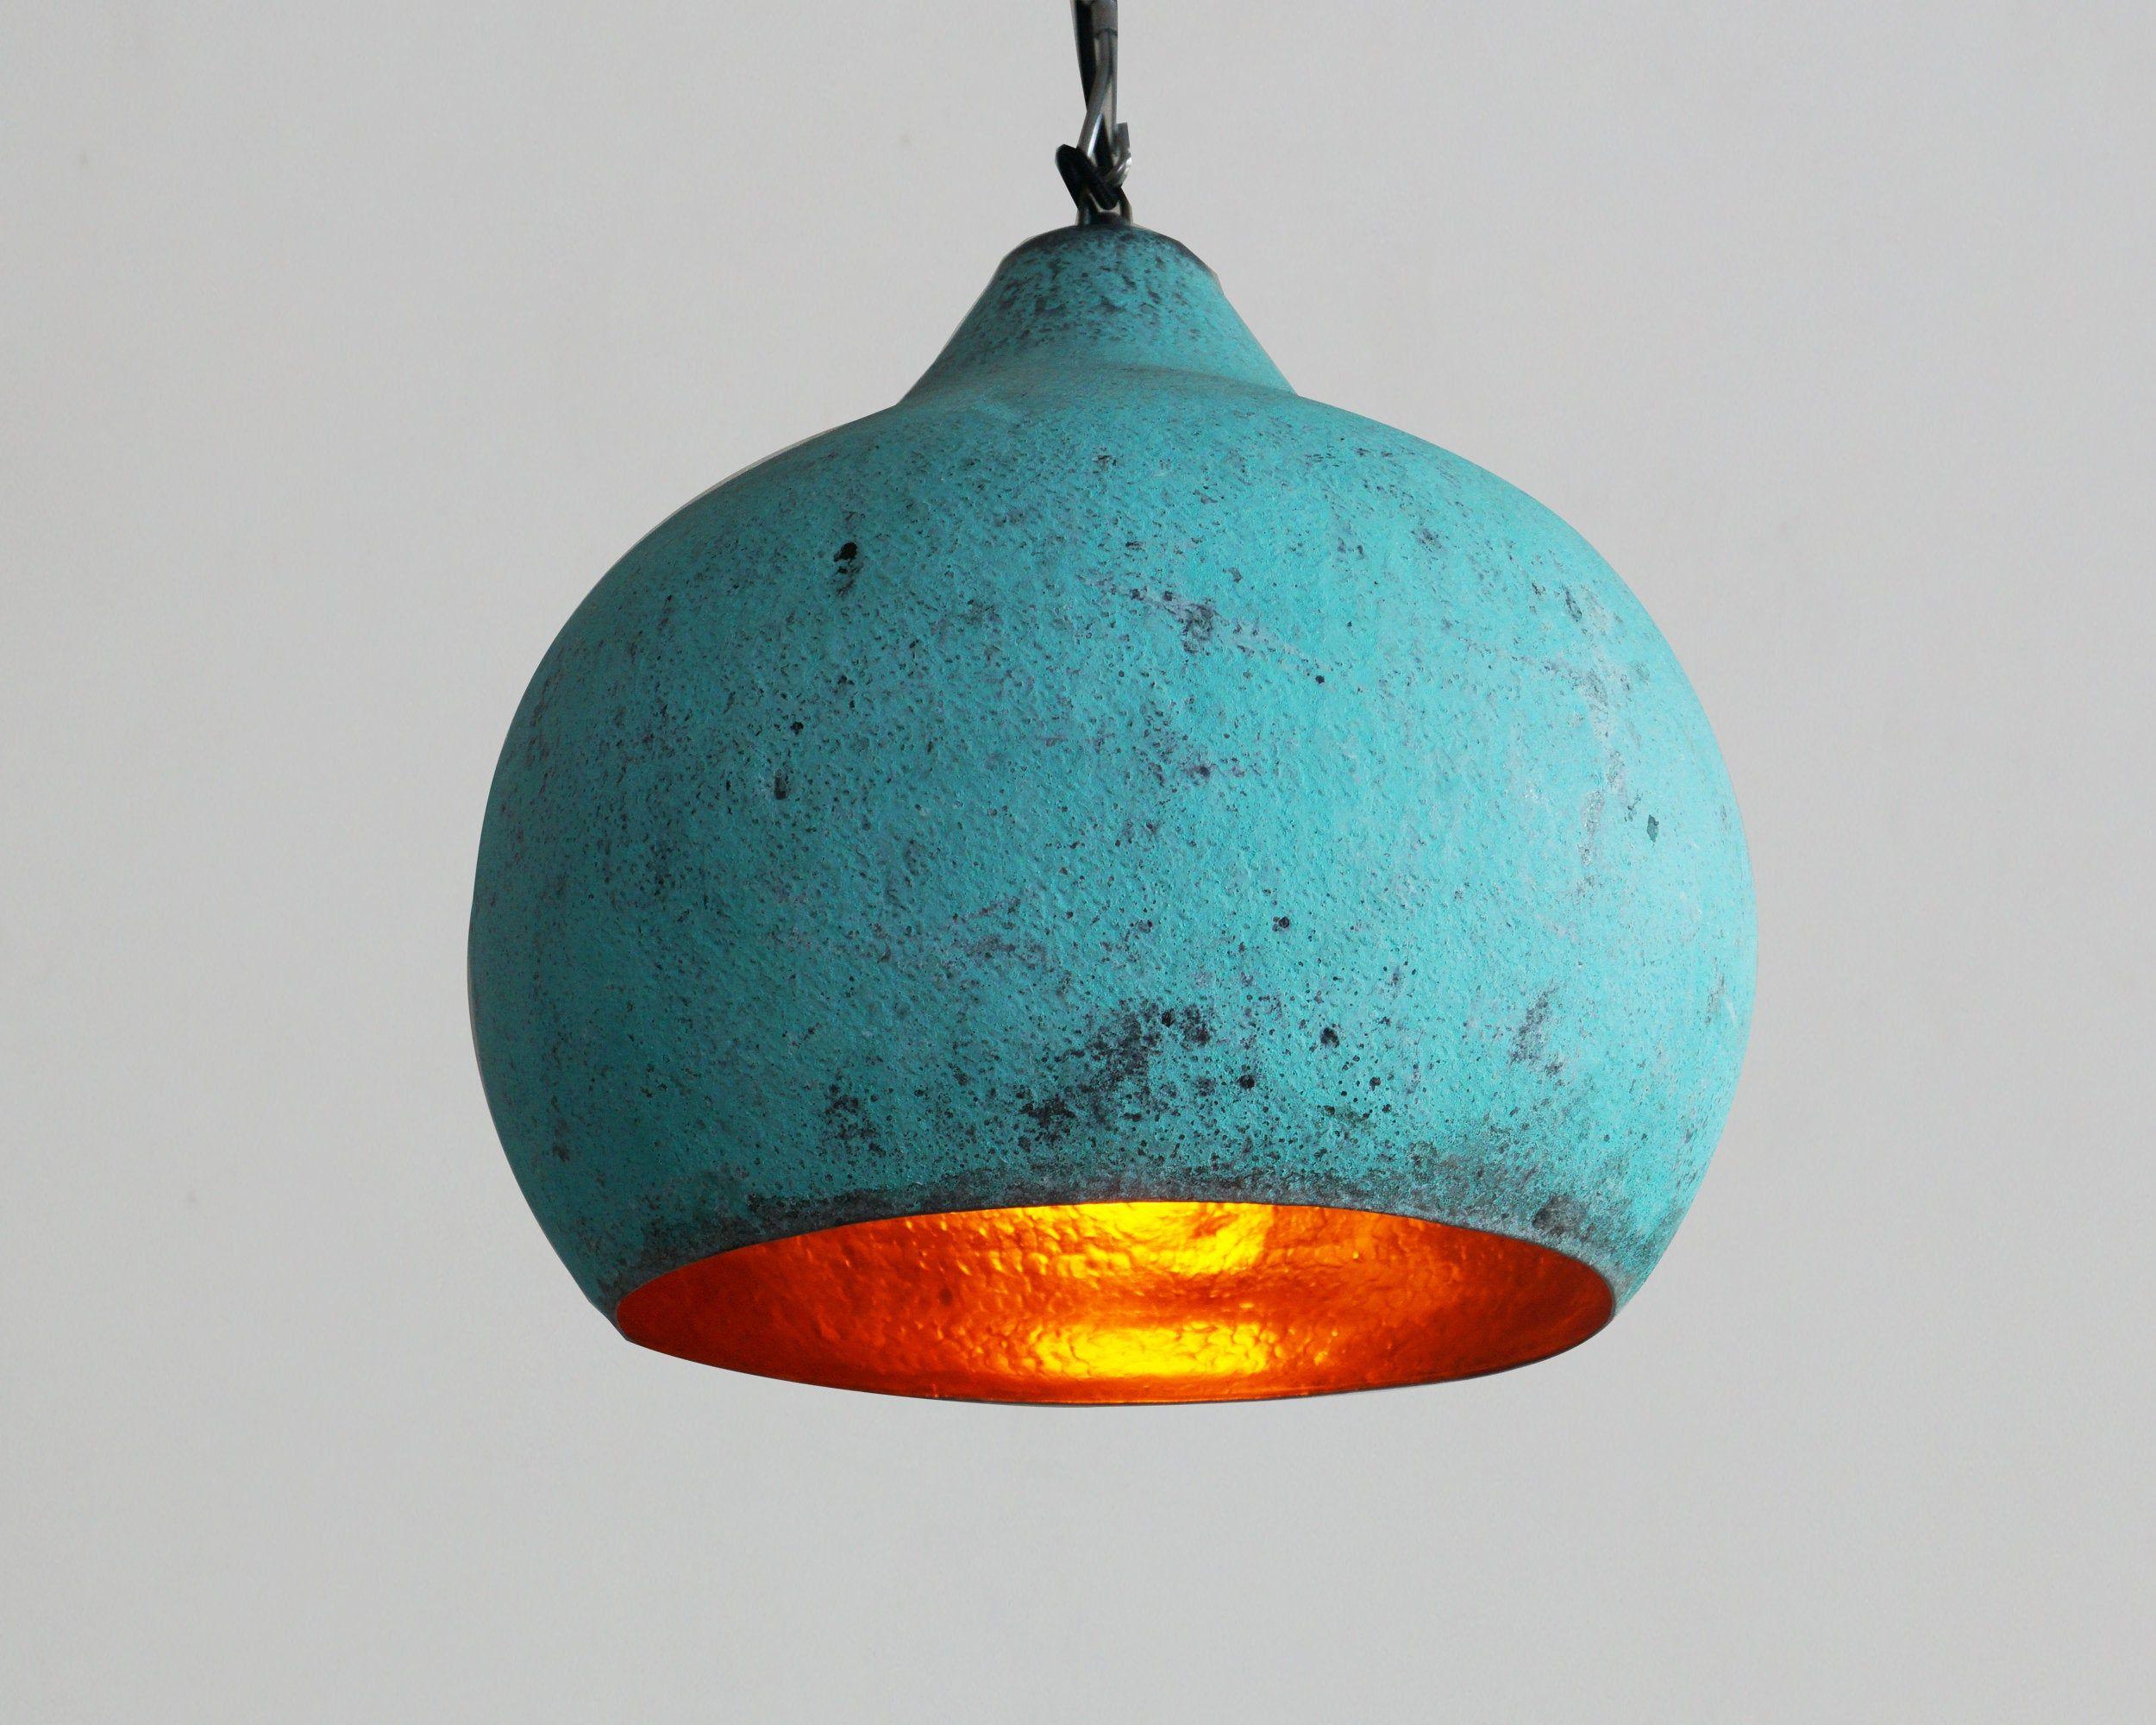 Green Patina Copper Pendant Light Oxidized Copper Kitchen Island Lighting Scandinavian Copper Copper Pendant Lamp Copper Pendant Lights Pendant Lamp Shade